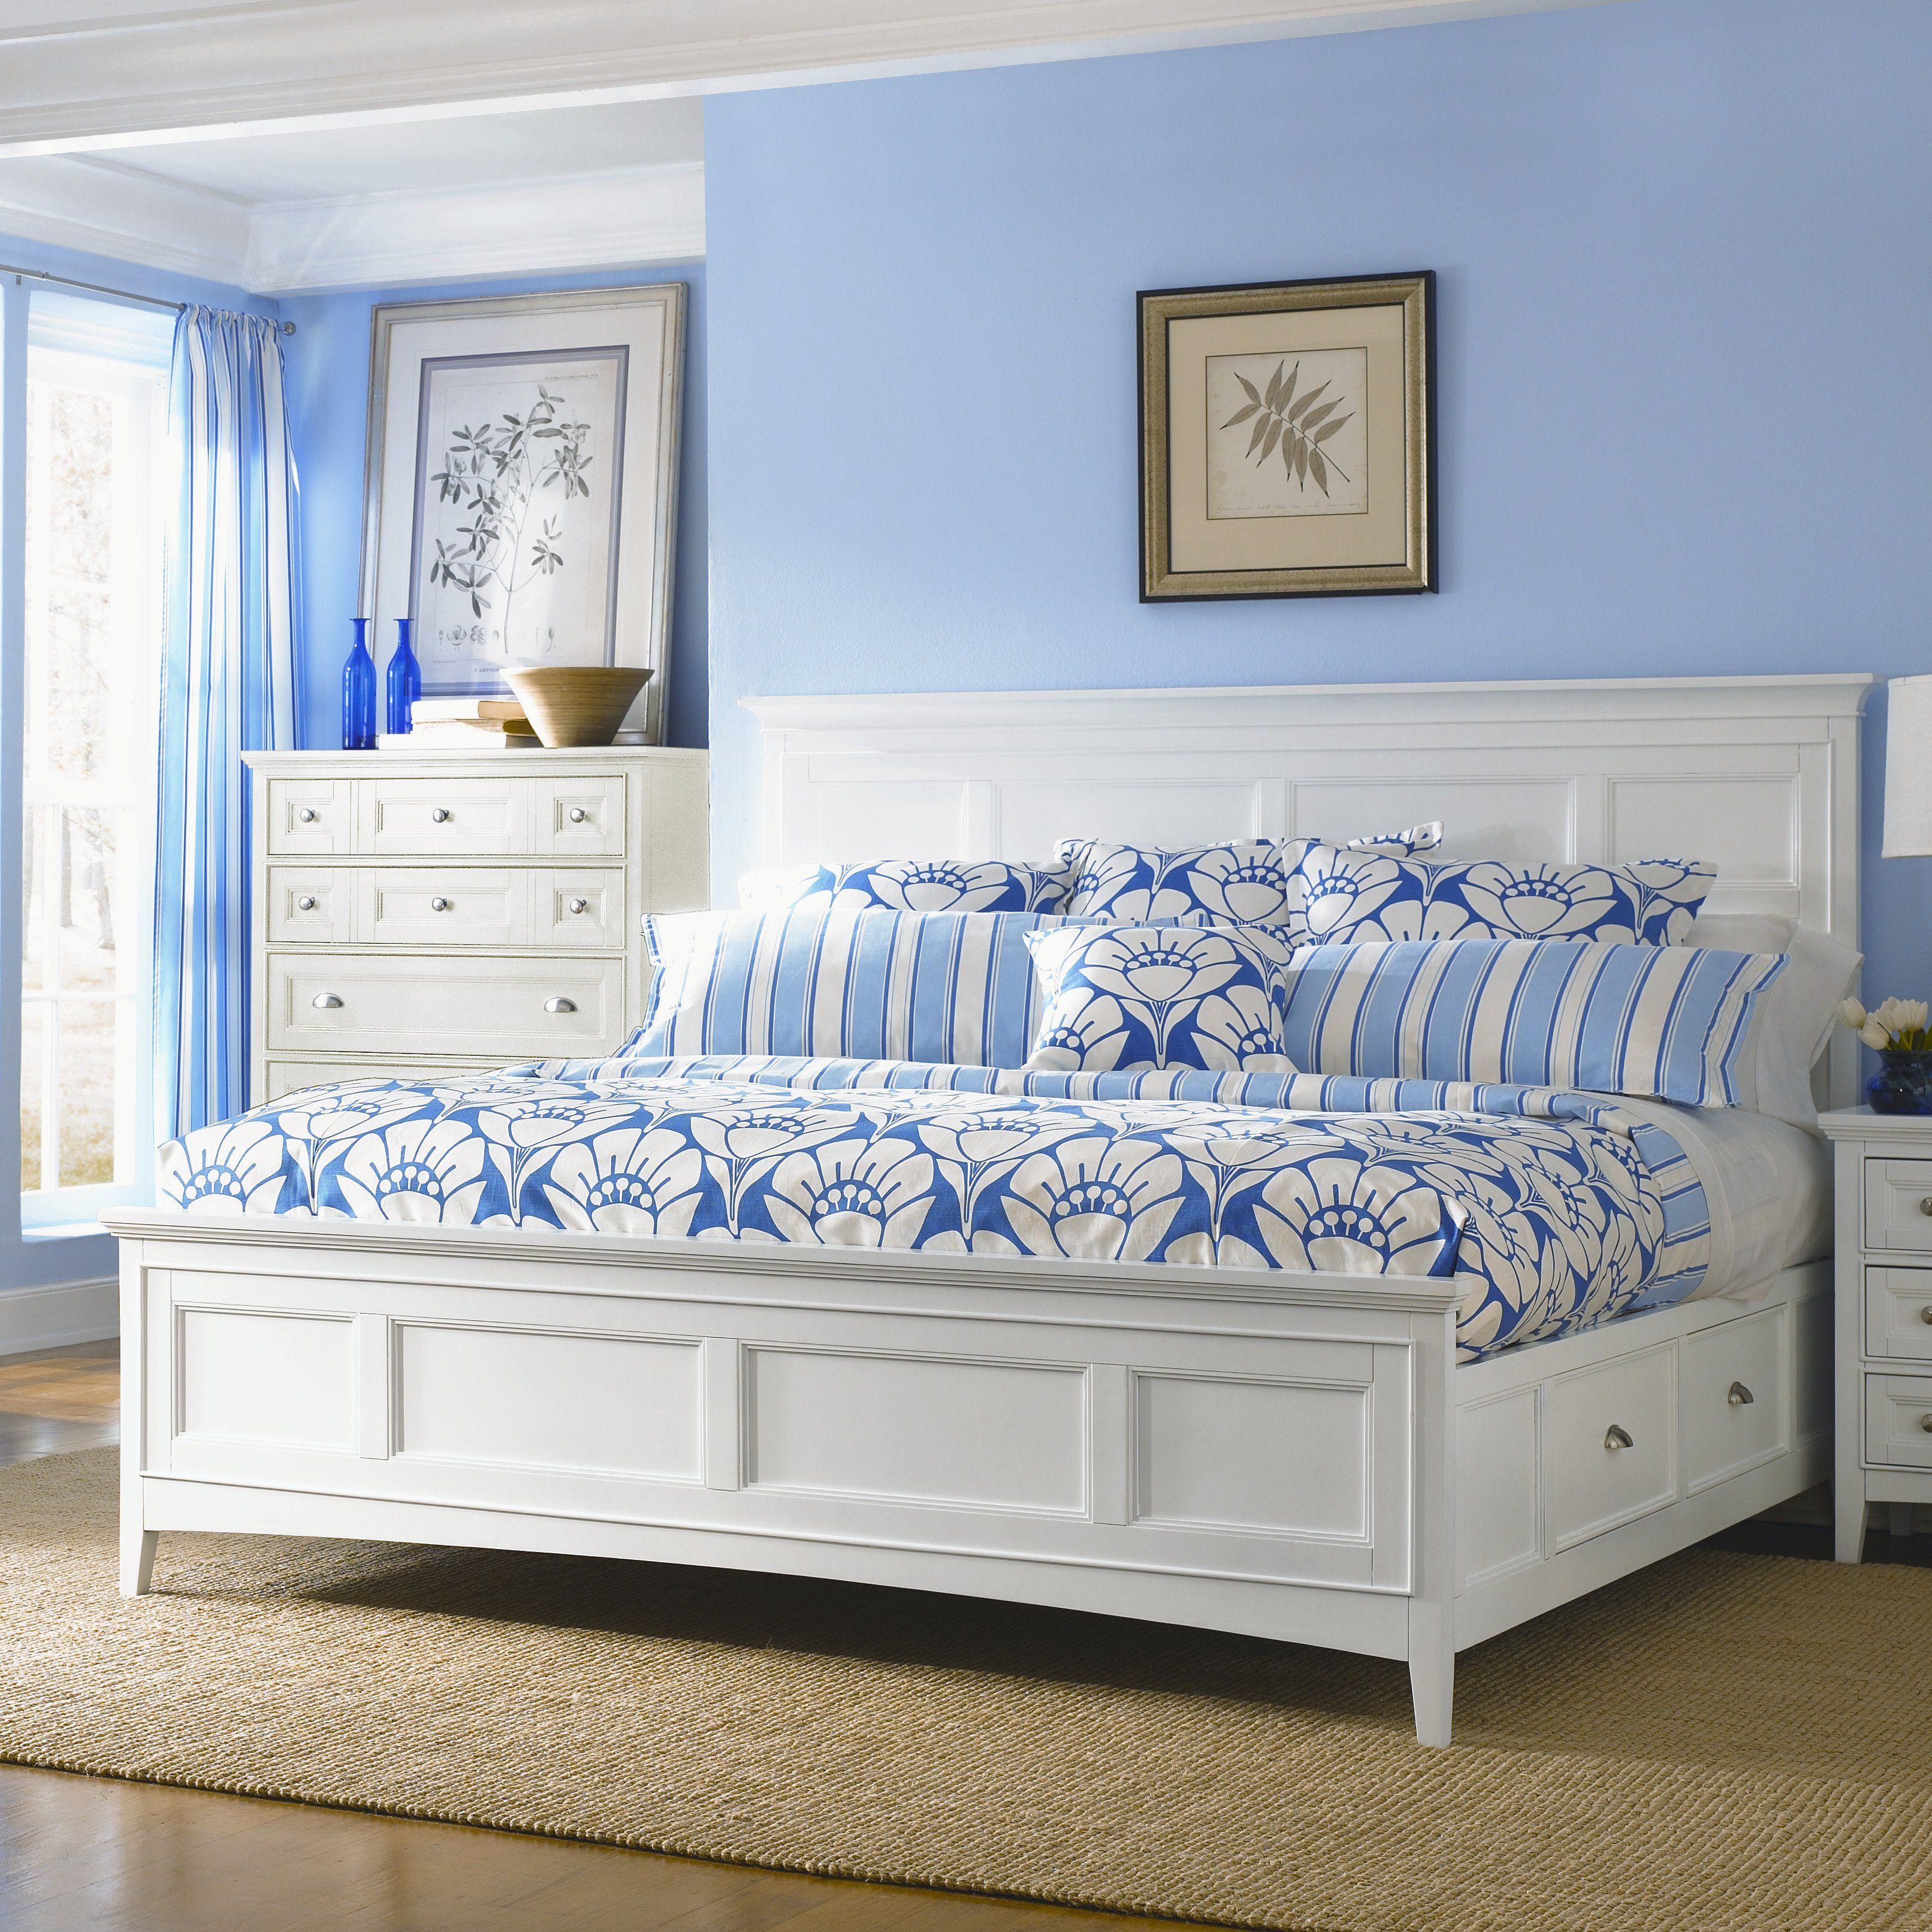 Kentwood Low Profile Storage Bed Set   $1079.99 @hayneedle.